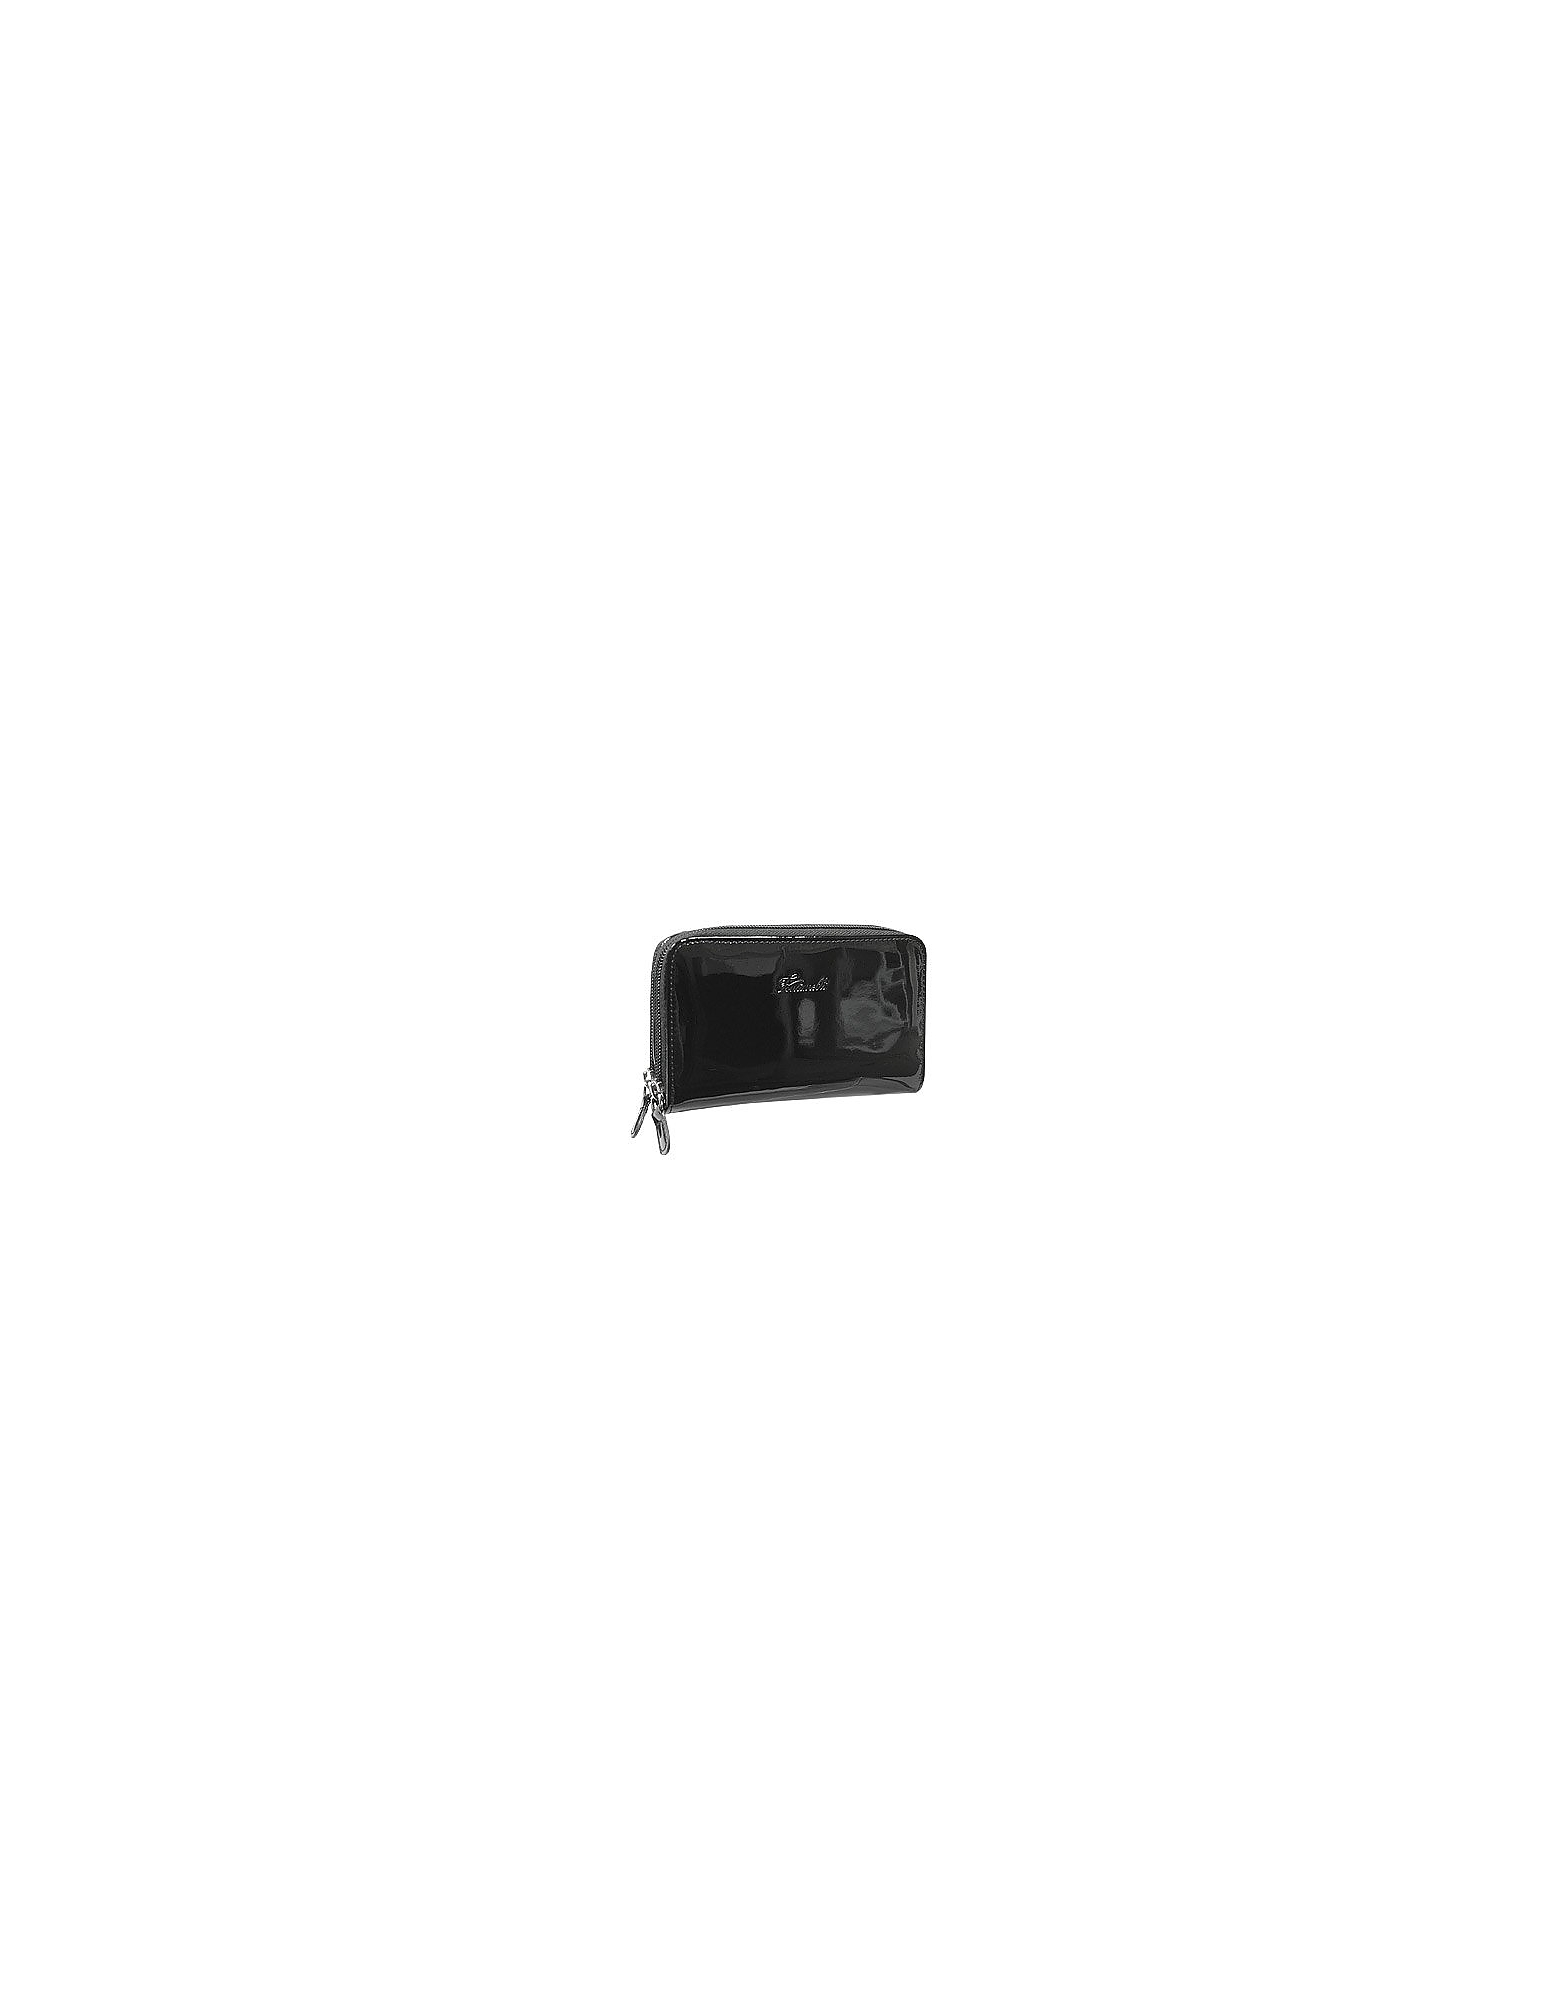 Fontanelli Wallets, Black Patent Leather Zip Wallet